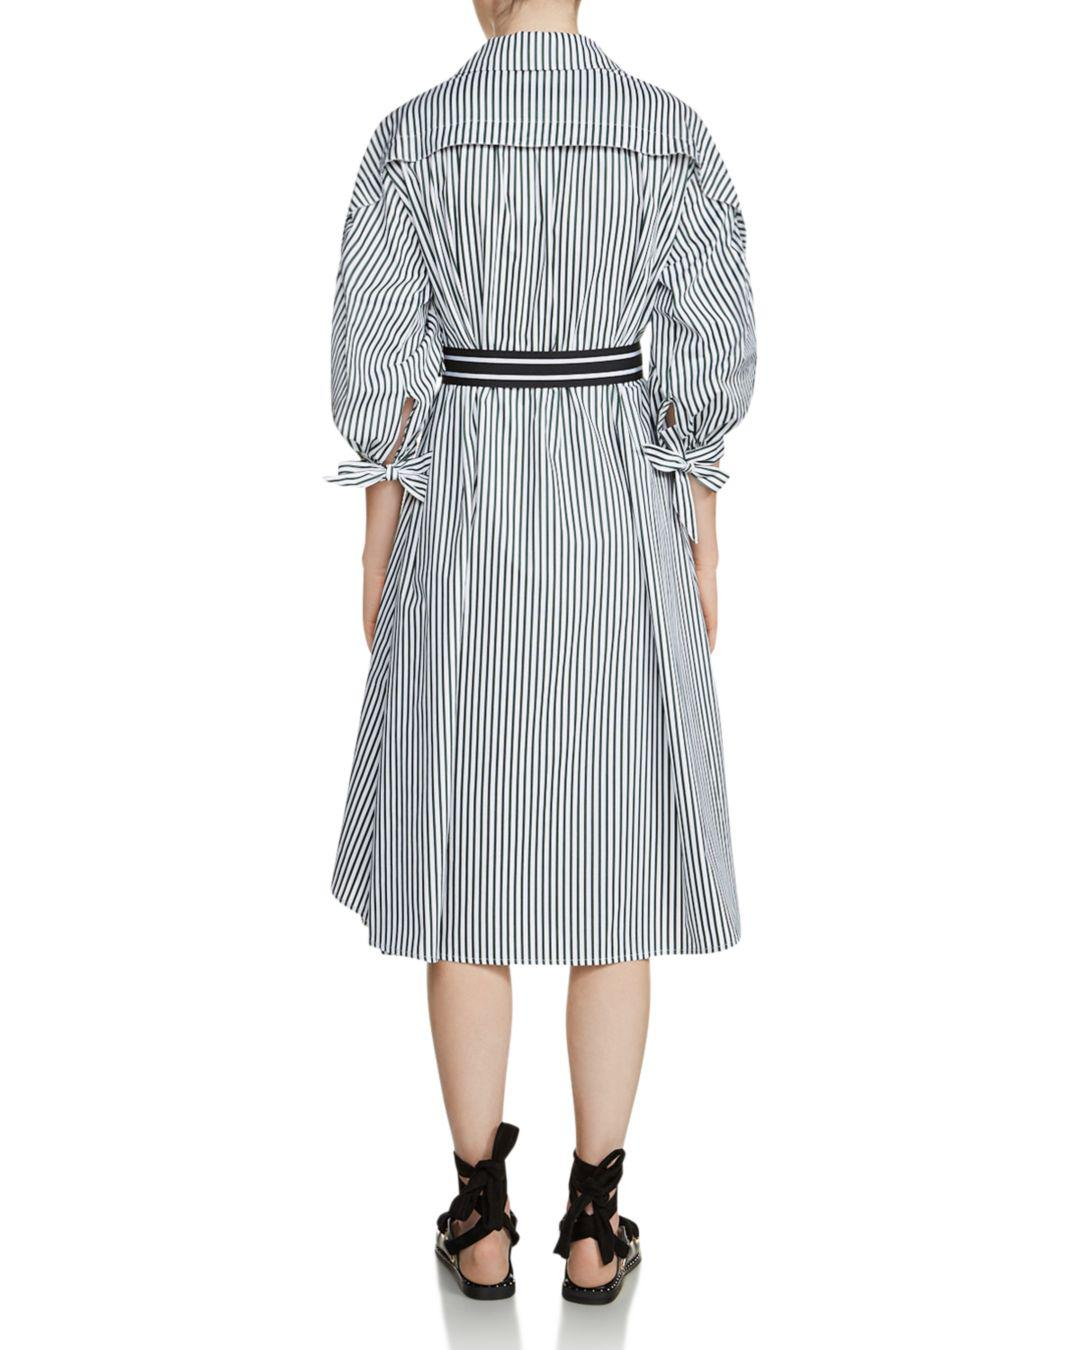 7ea704009b8 Maje Rilucci Oversized Striped Shirt Dress in Gray - Lyst